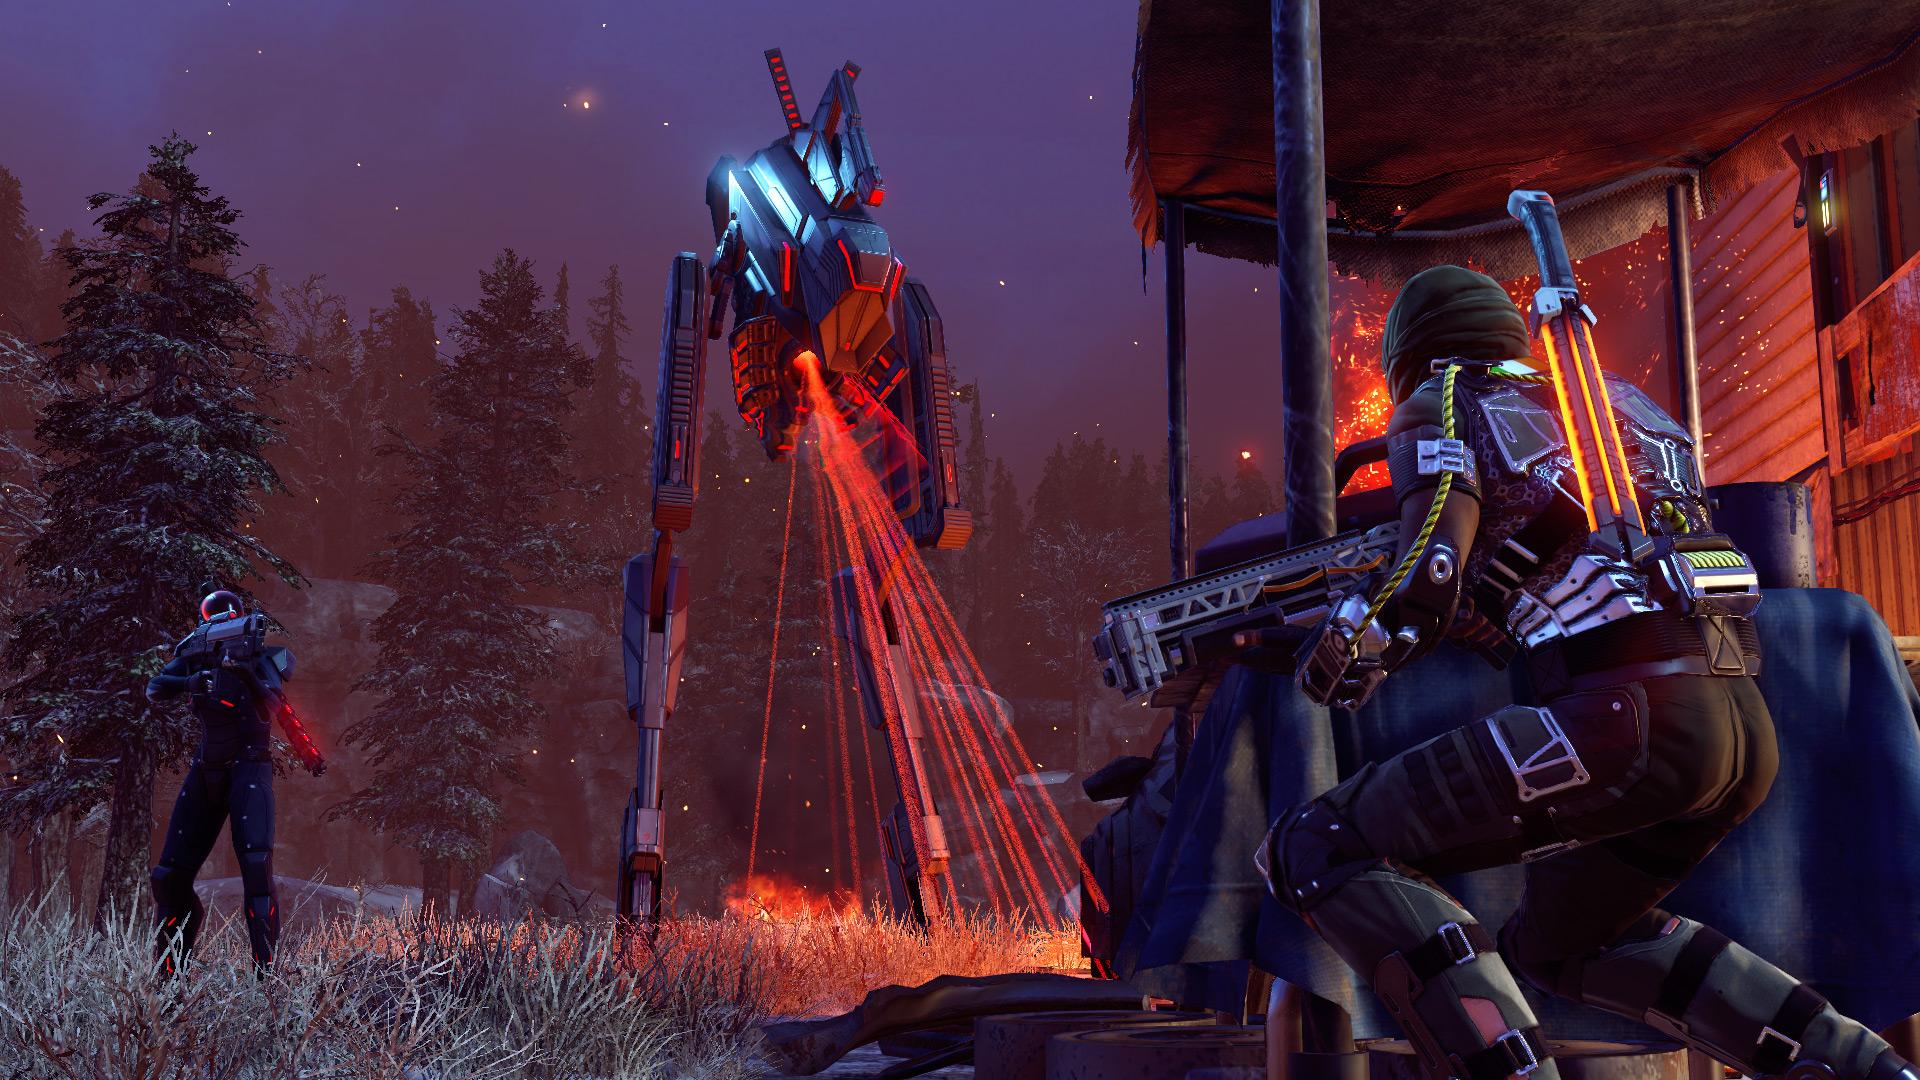 Strider (Half-Life 2) Vs Sectopod (XCOM 2) | SpaceBattles ...